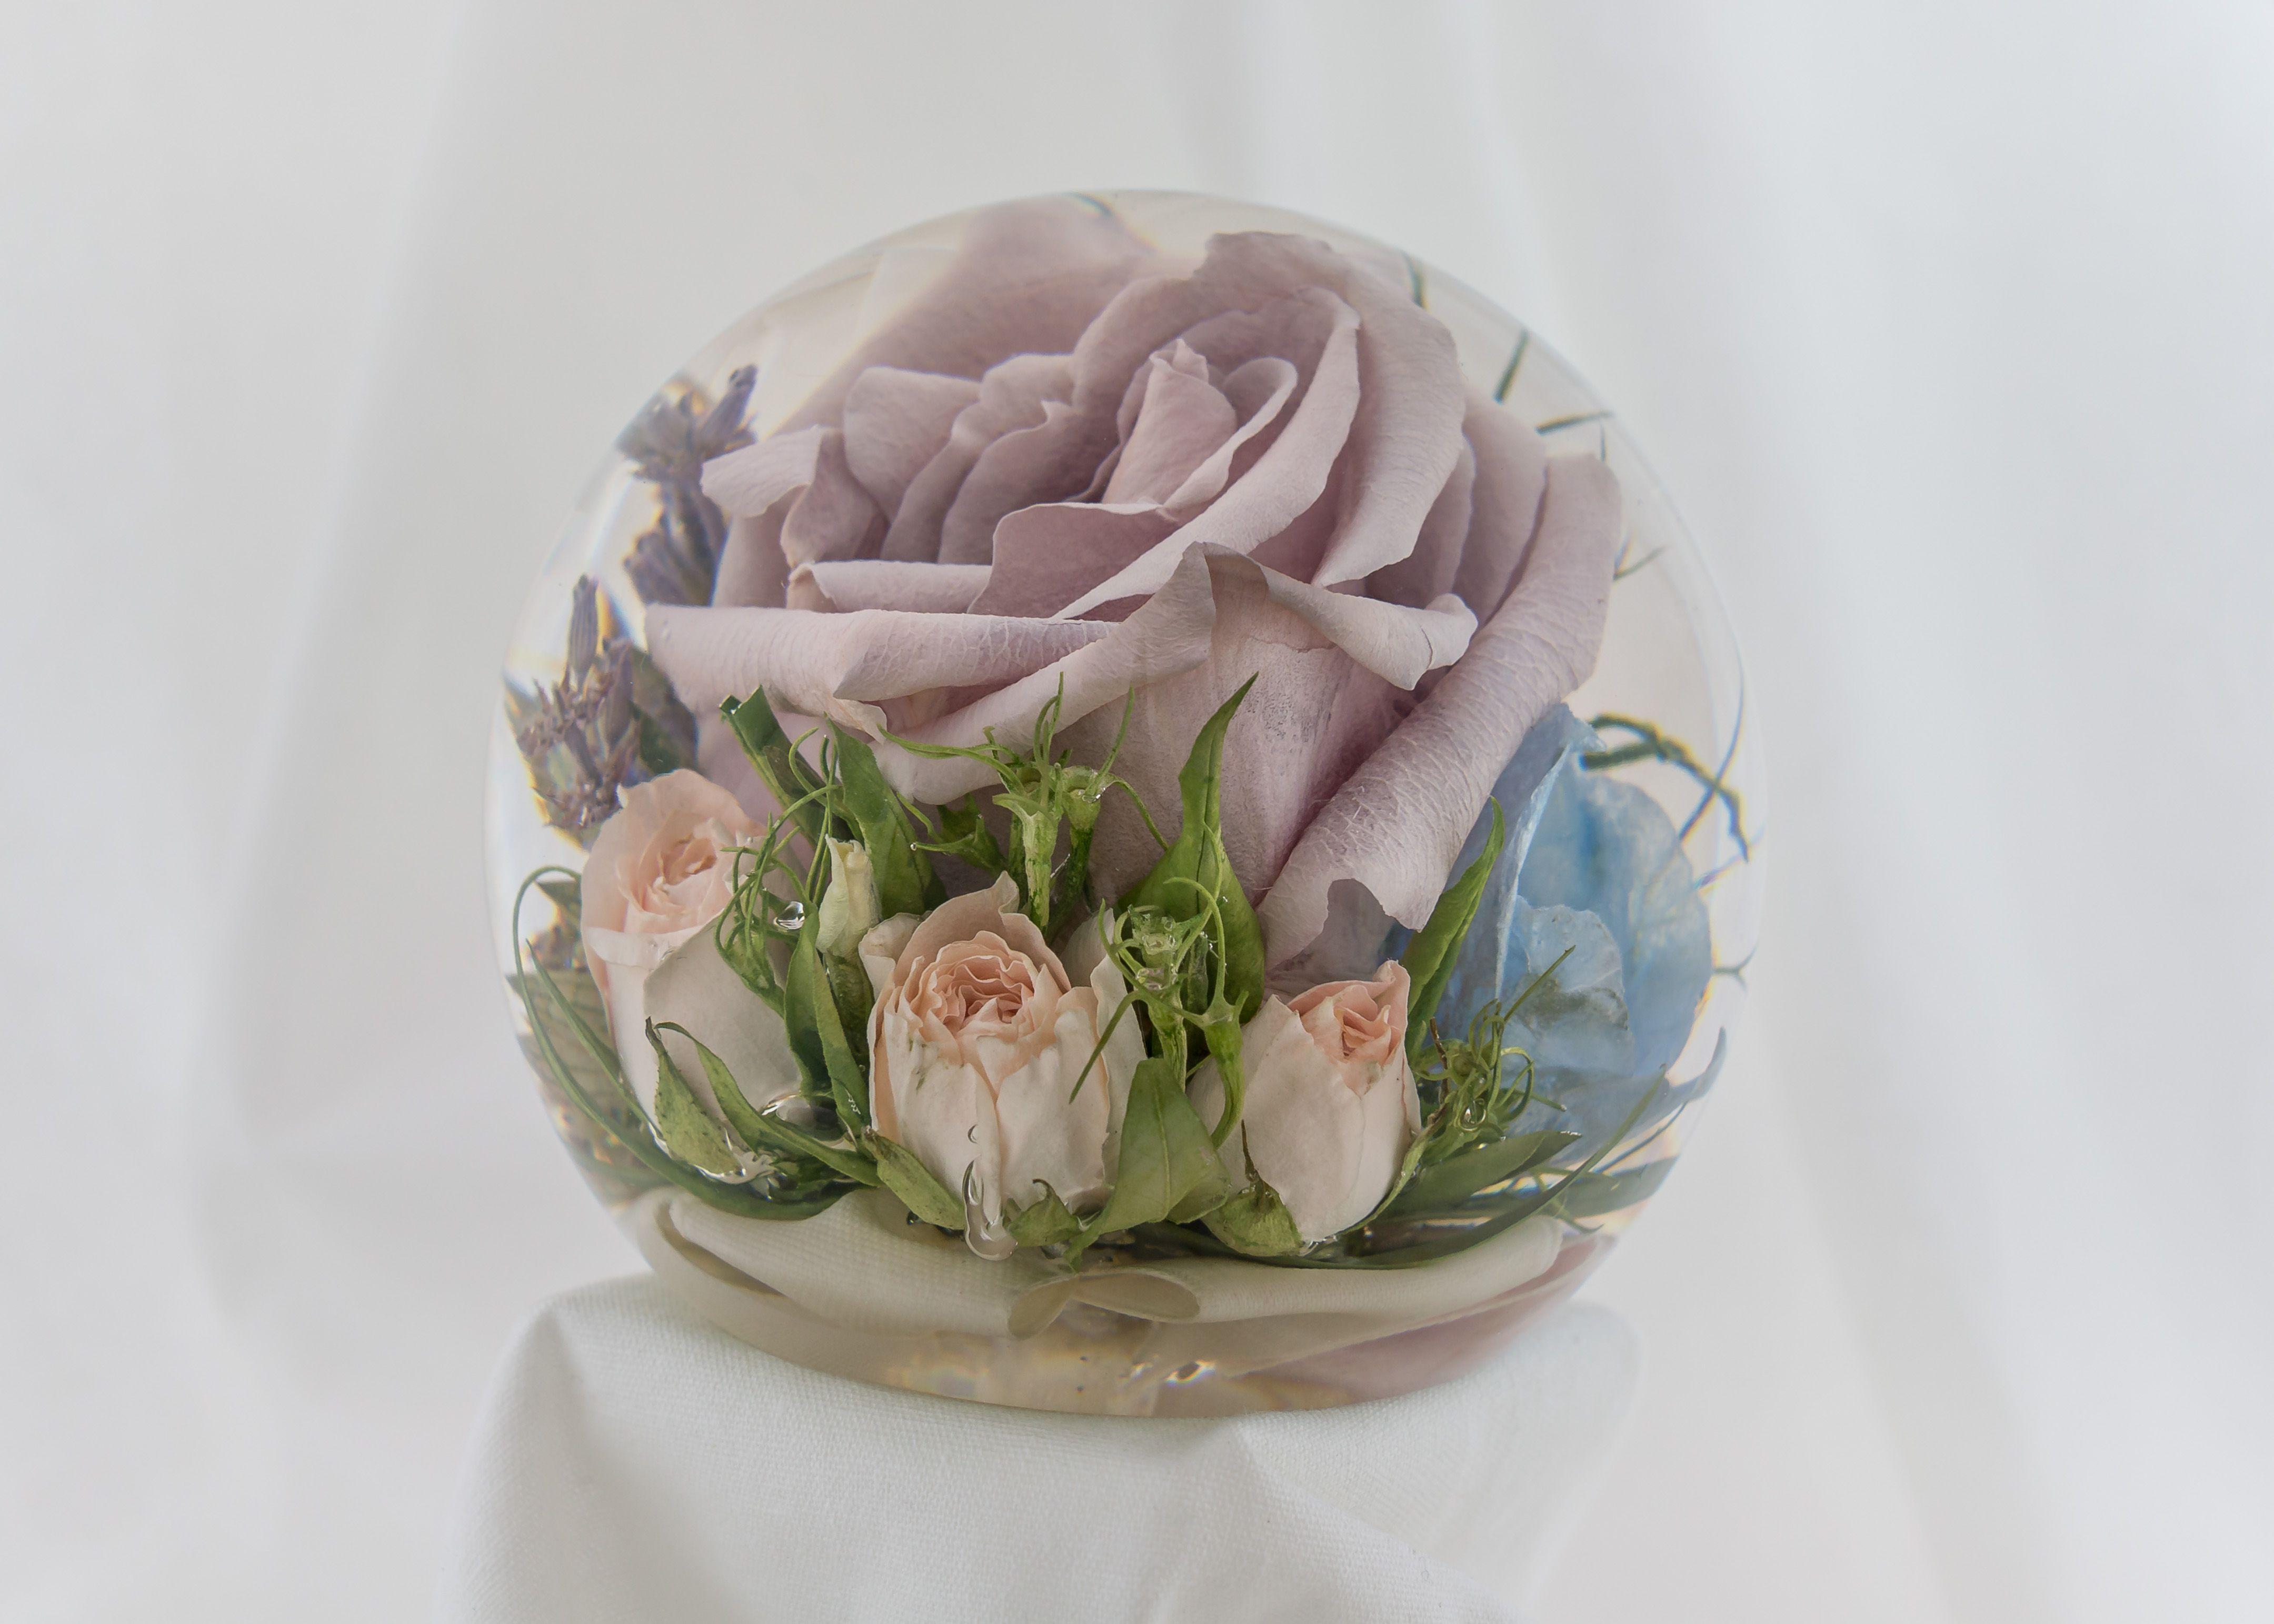 Stunning 3 5 Bespoke Flower Paperweight After The Wedding